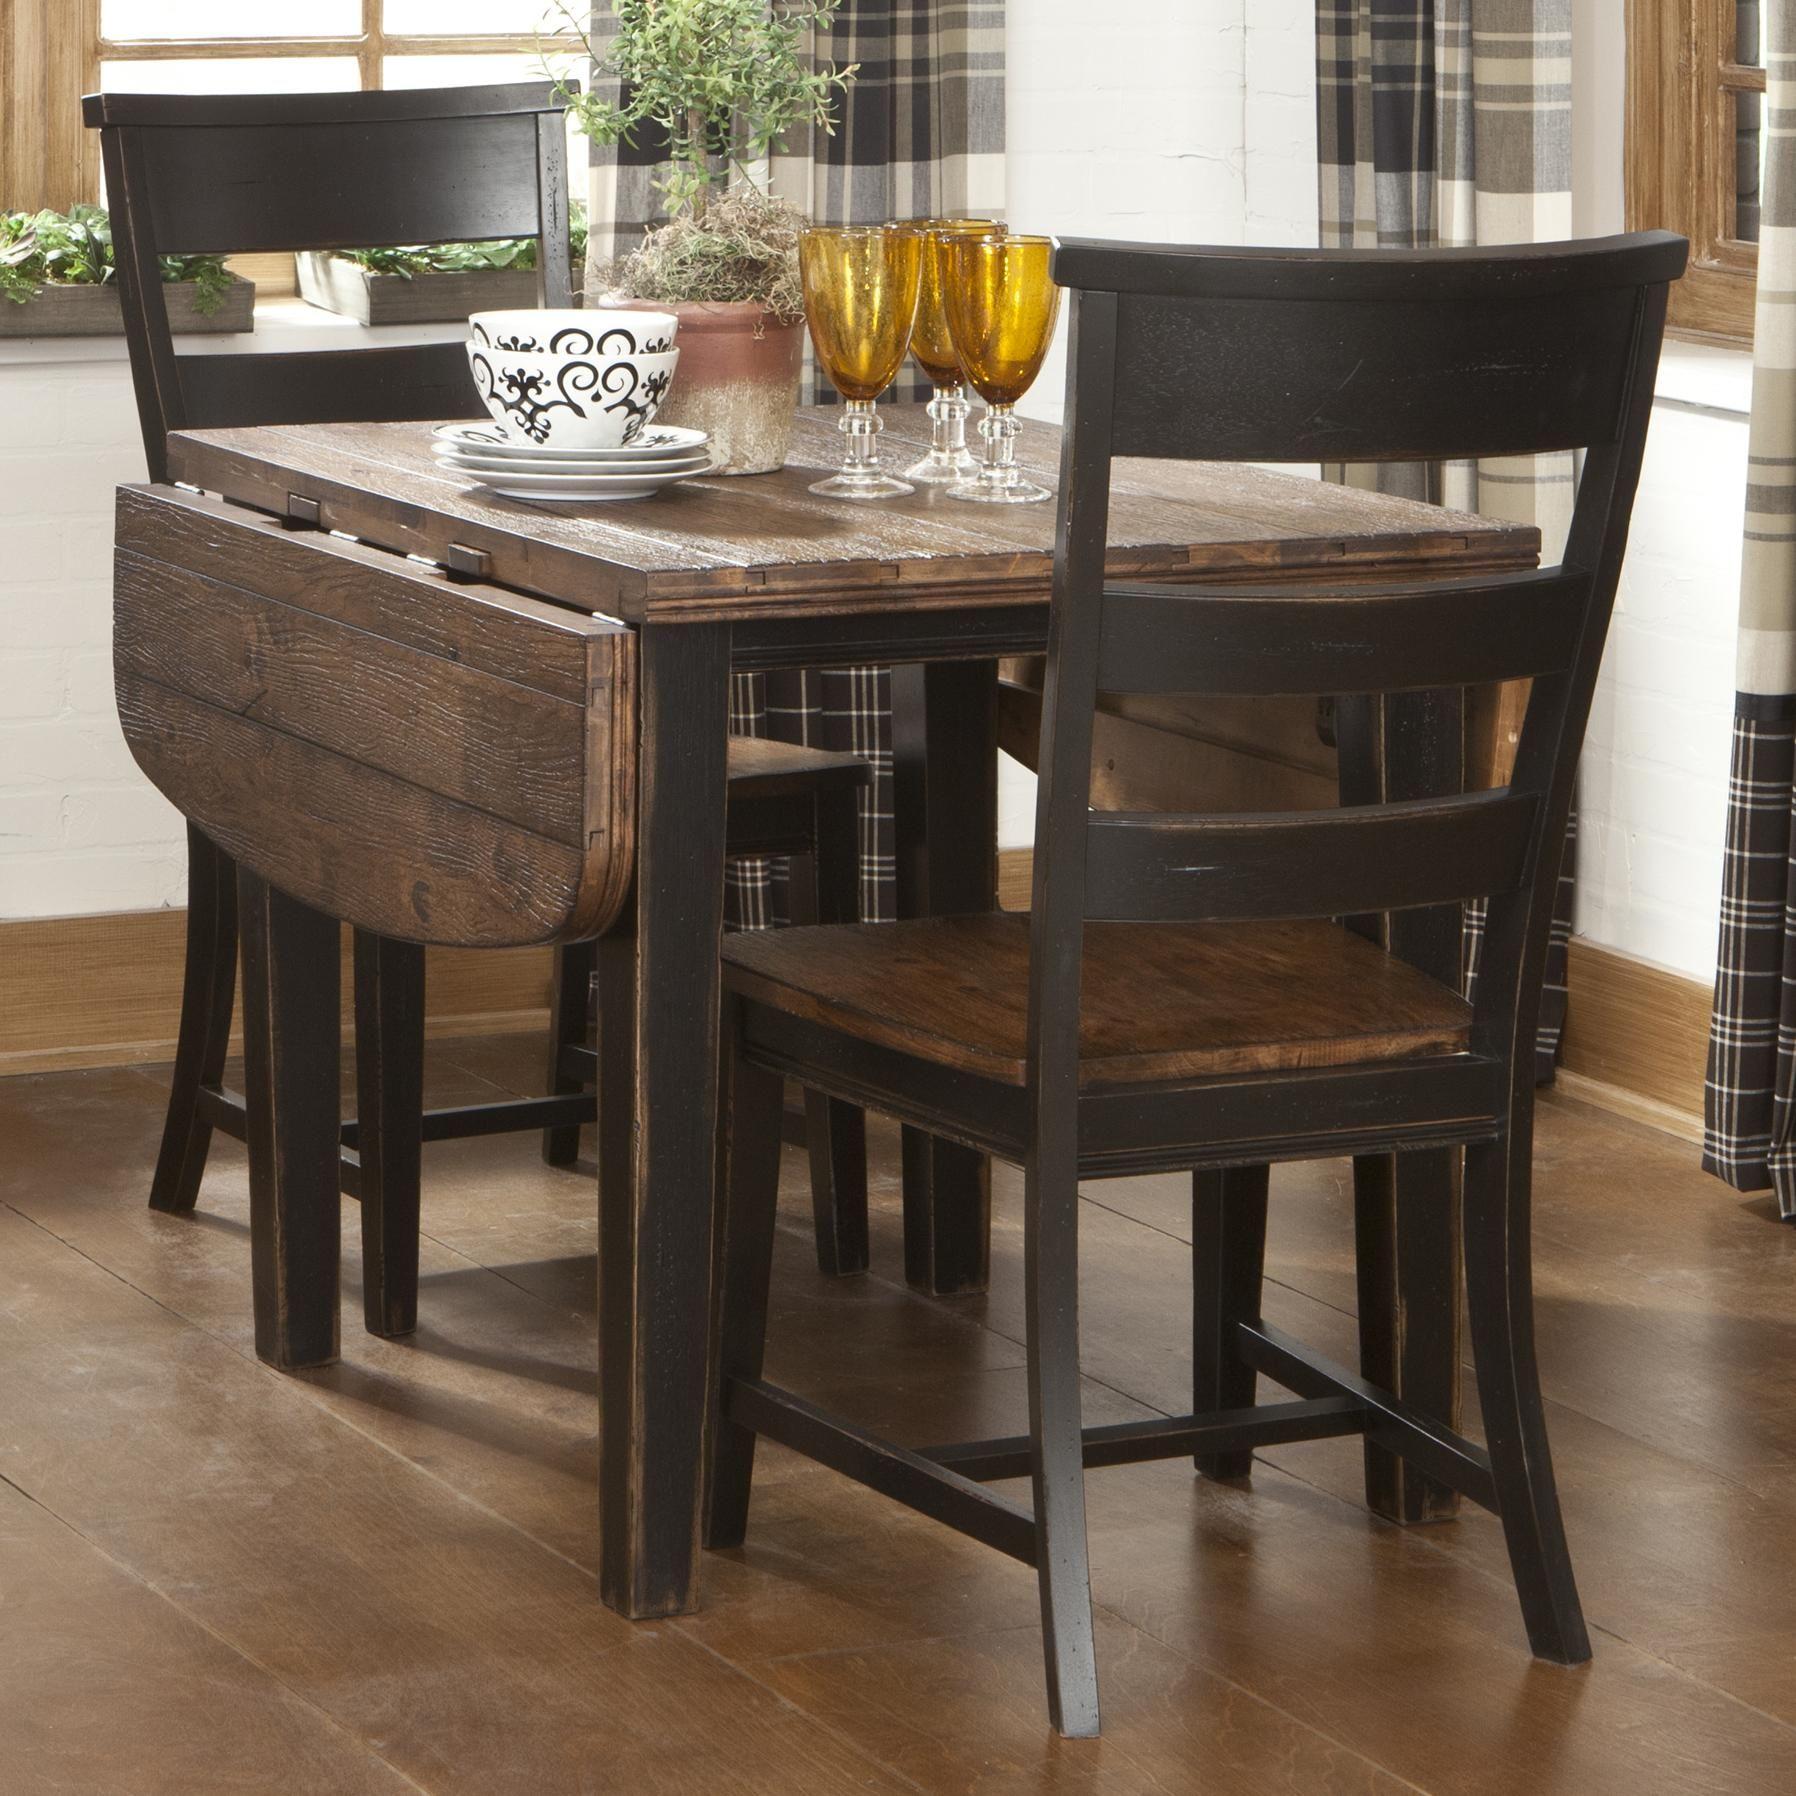 Winchester 3 Piece Drop Leaf Table Setintercon  Breakfast Pleasing 3 Piece Kitchen Table Set Inspiration